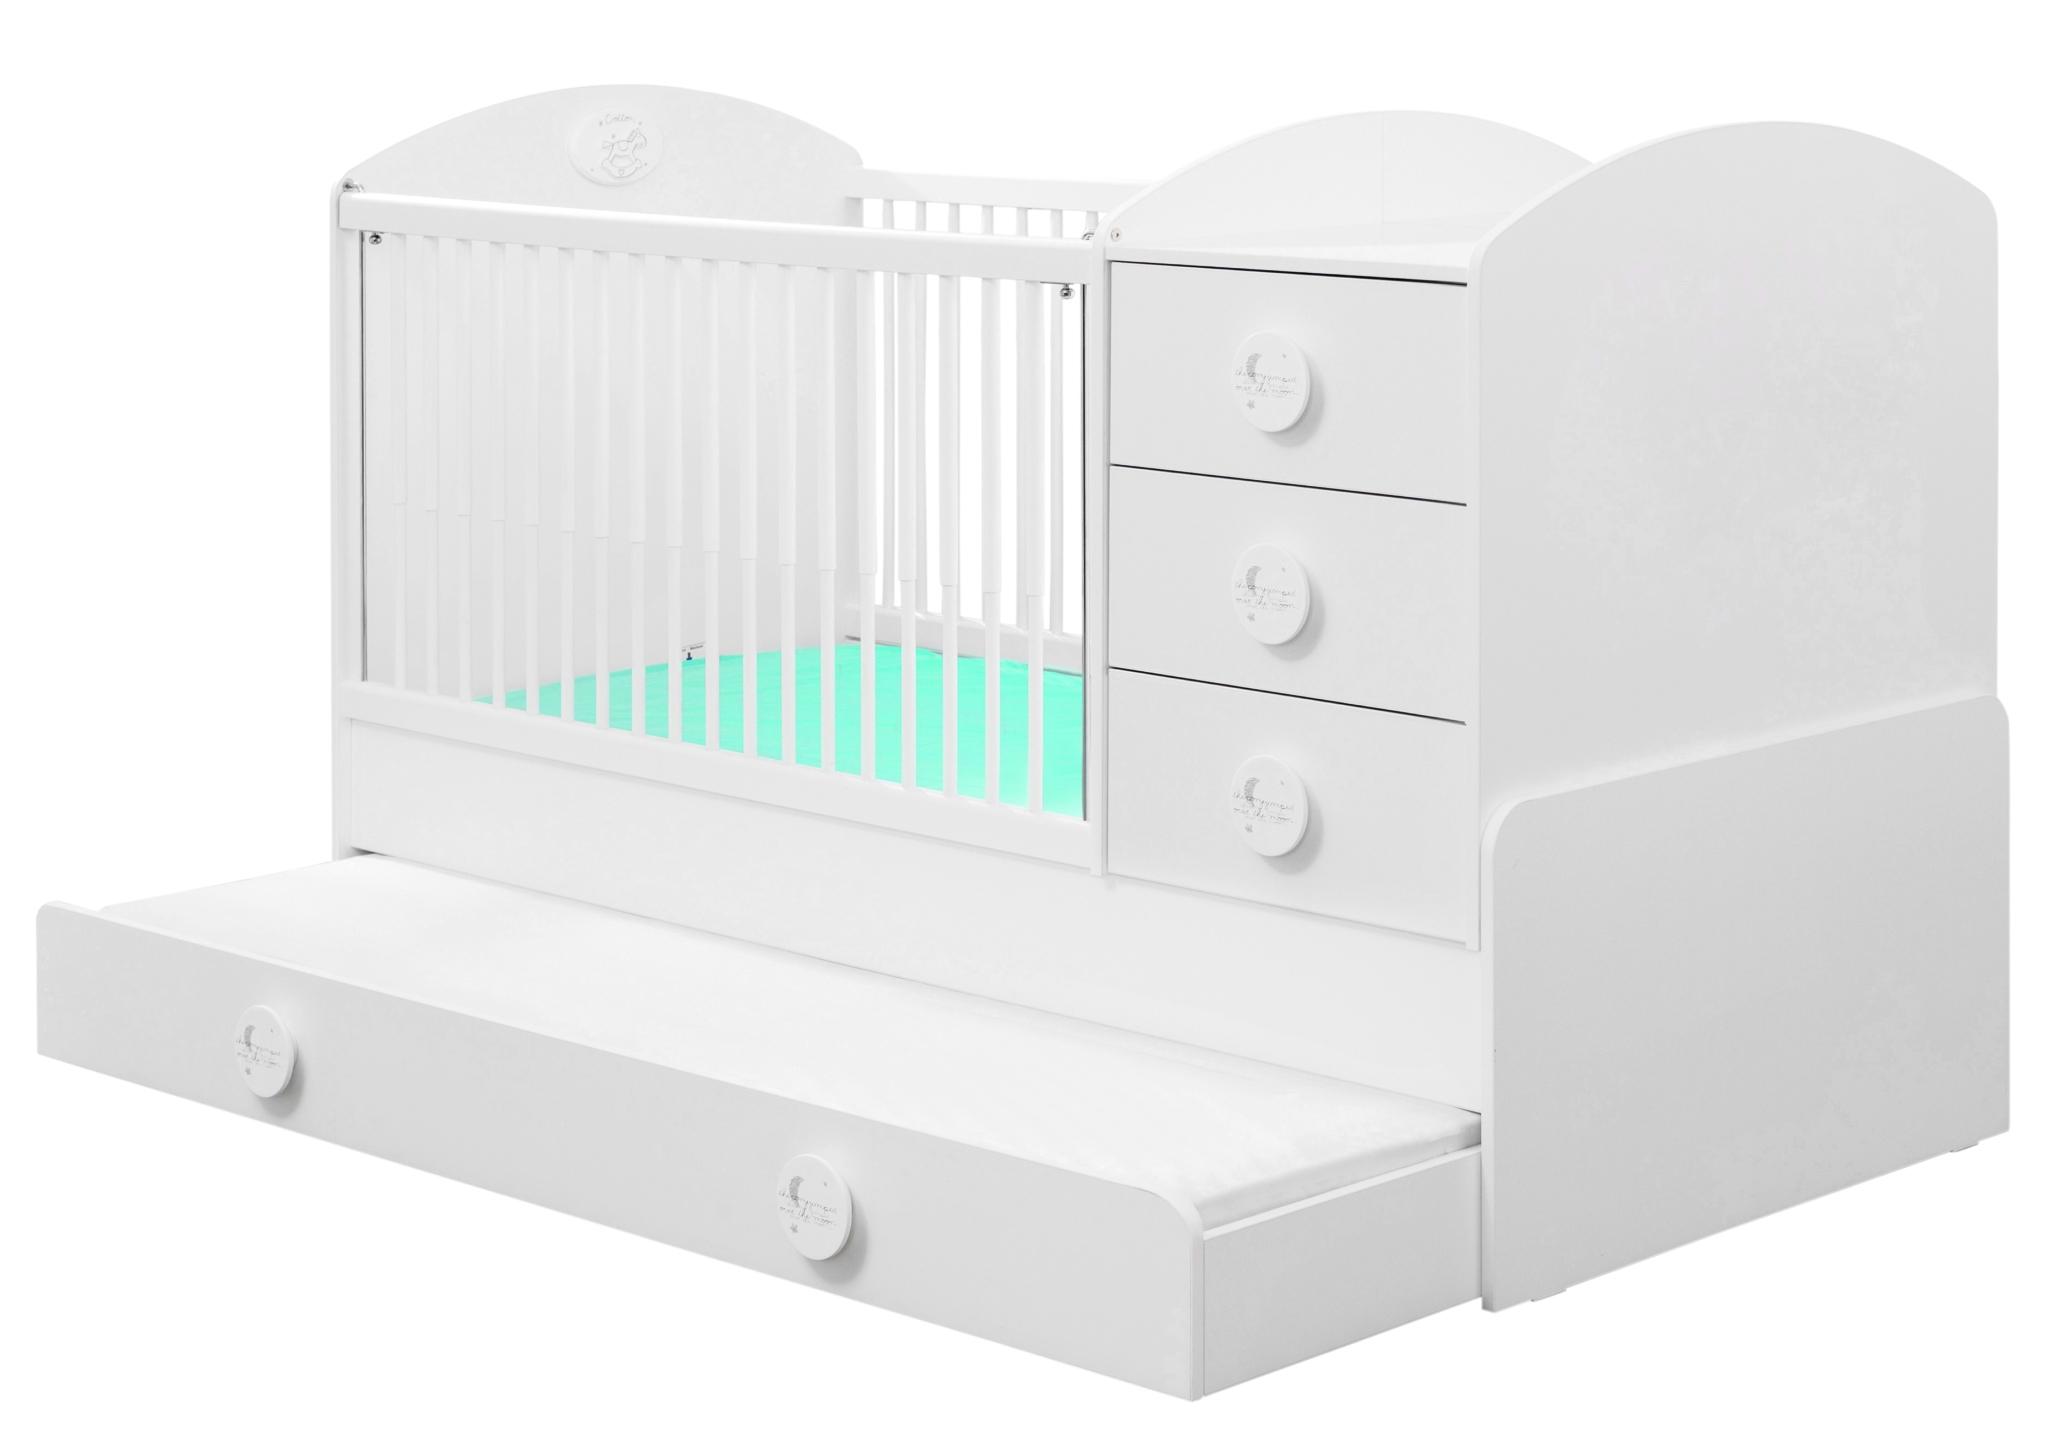 Patut transformabil din pal cu sertar pentru bebe Baby Cotton White 180 x 80 cm